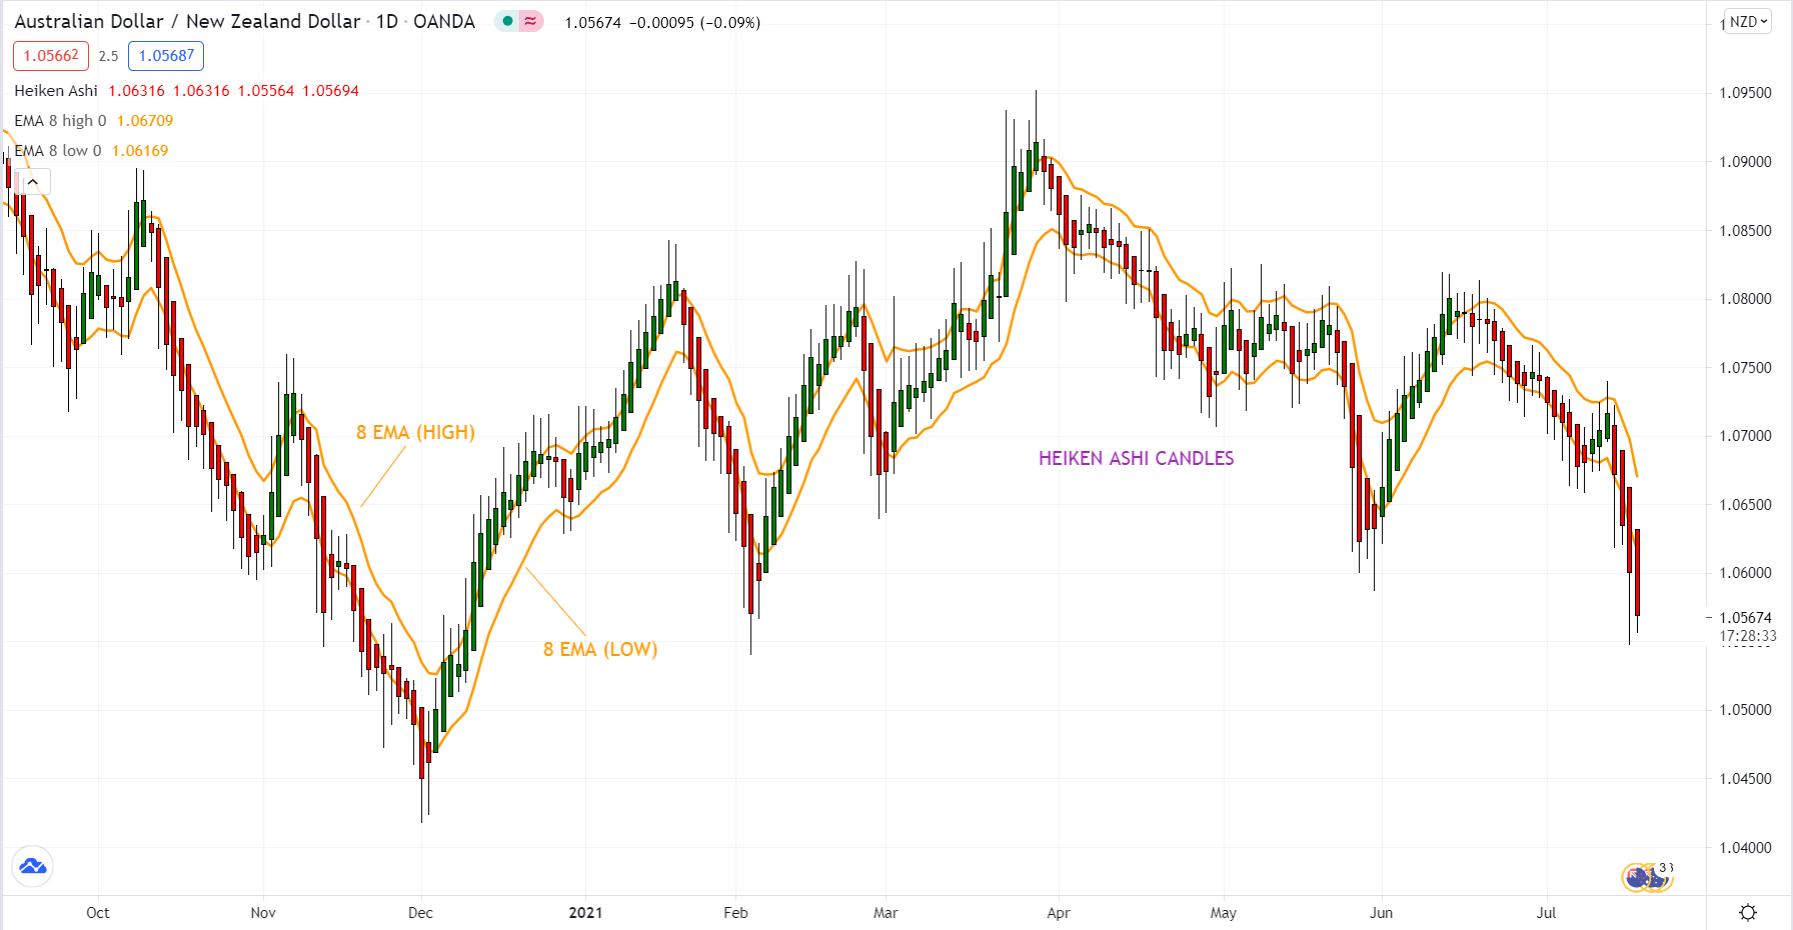 Australian Dollar/ New Zeland Dollar_1D